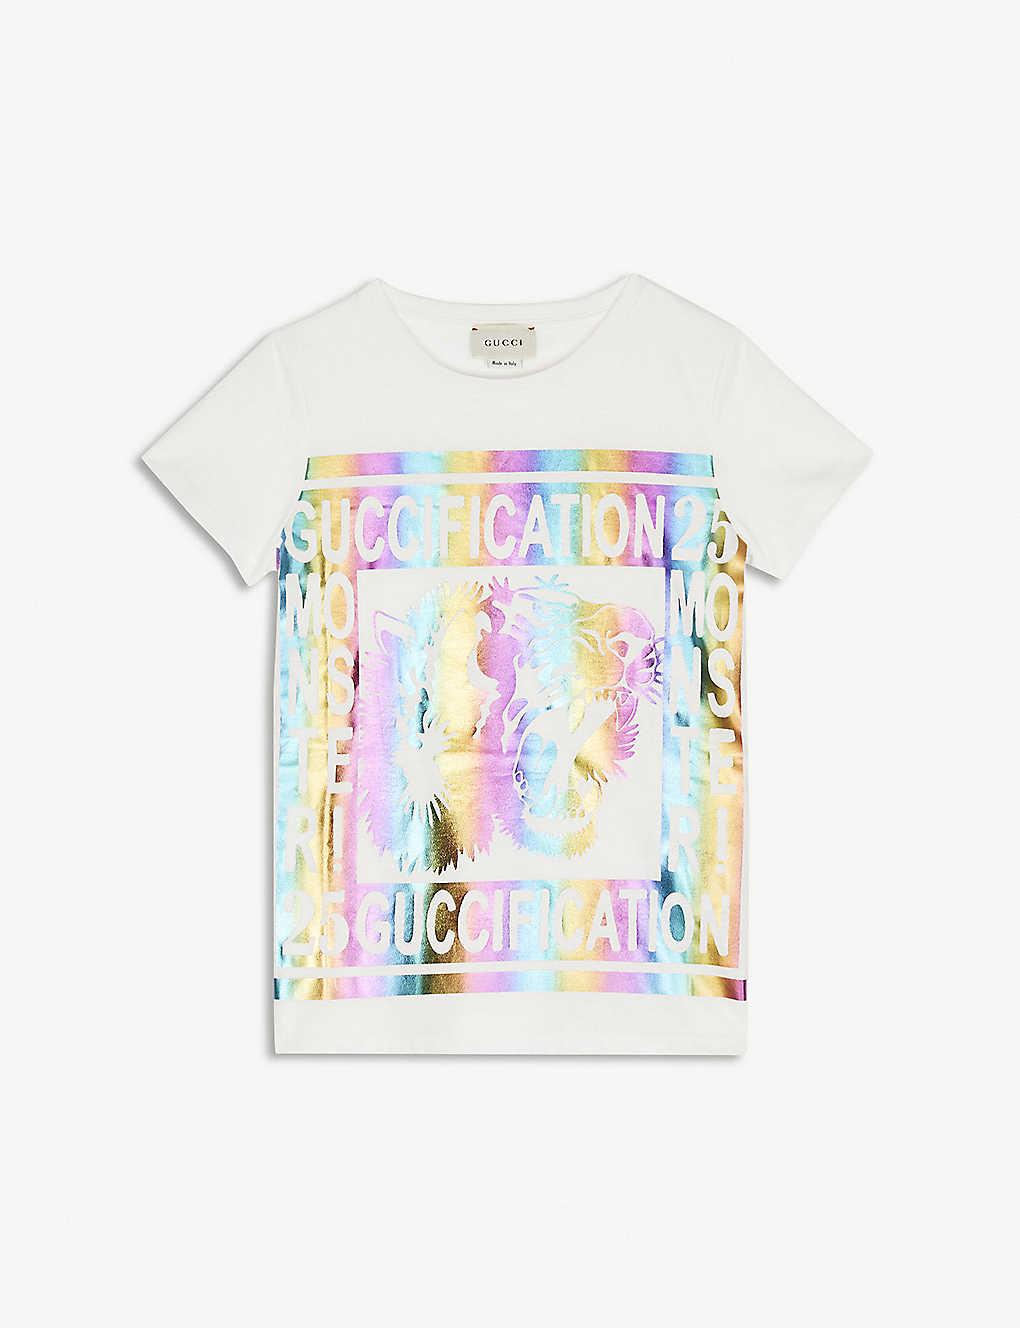 a1dcc55c4375 GUCCI - Guccification metallic logo cotton T-shirt 4-12 years ...